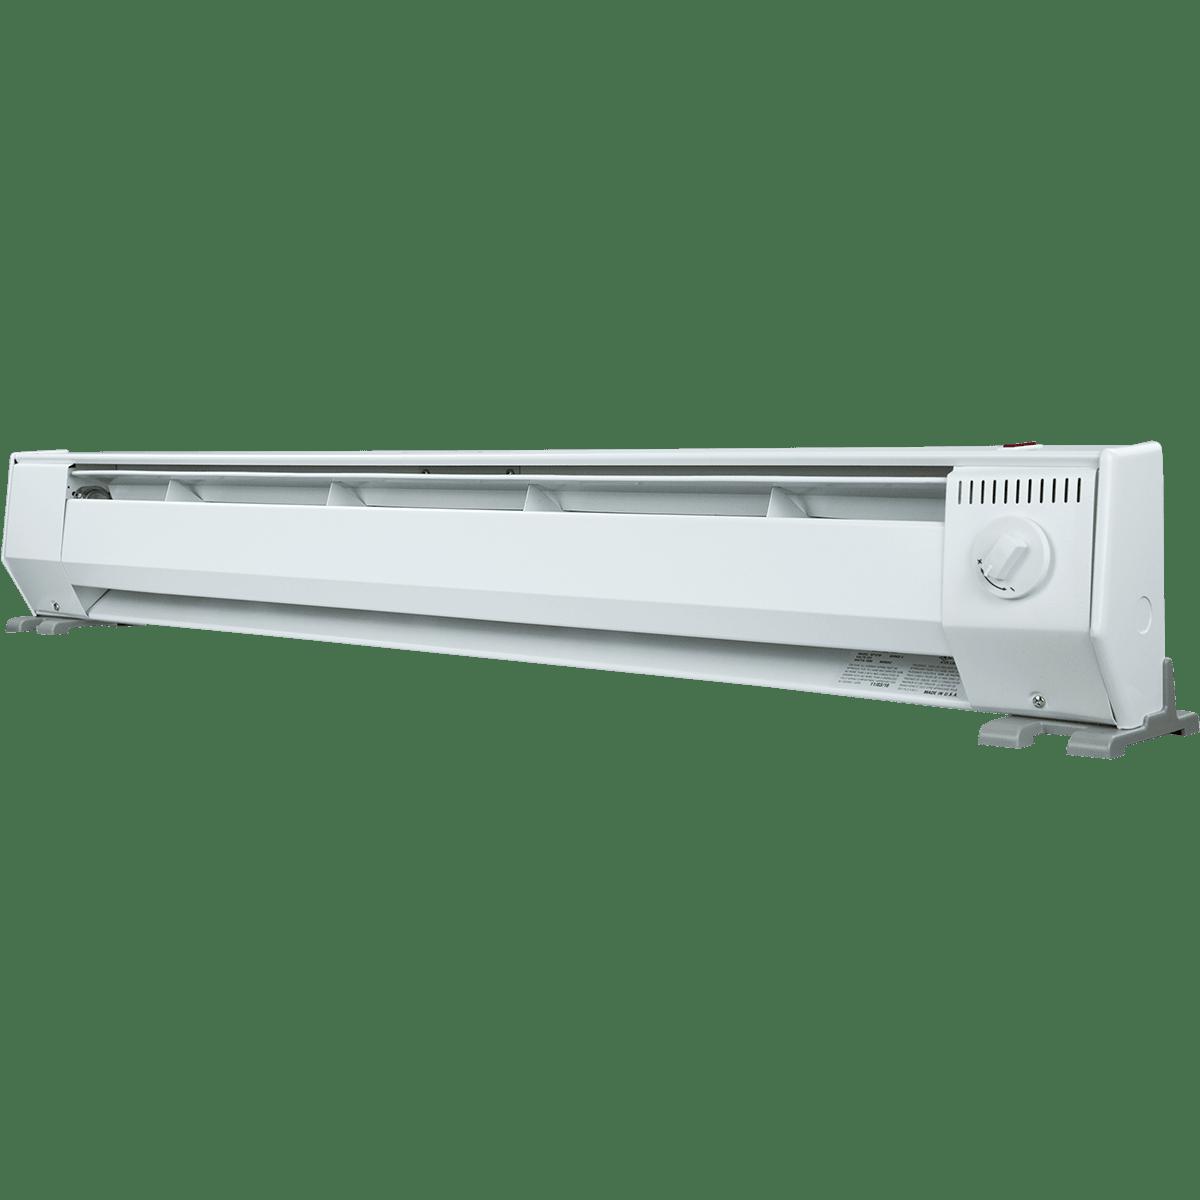 Delicieux King Electric KP1210 1000 Watt Portable Baseboard Heater | Sylvane